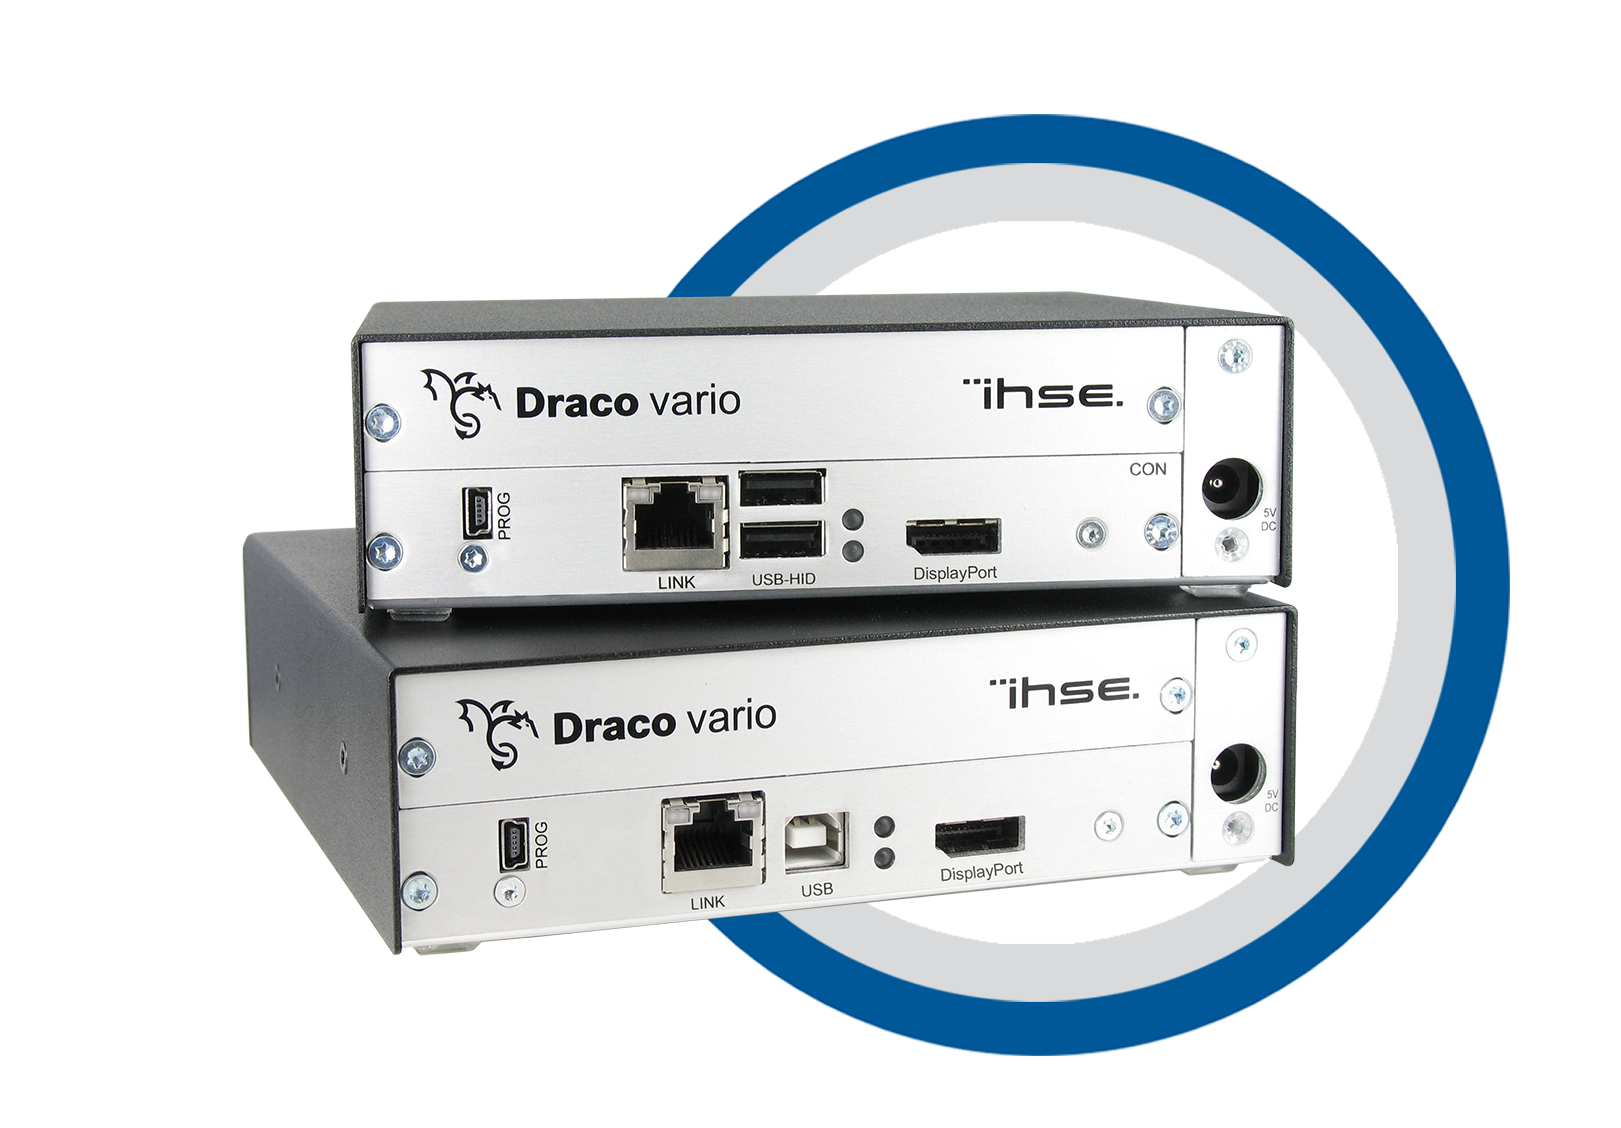 ihse Draco vario DisplayPort